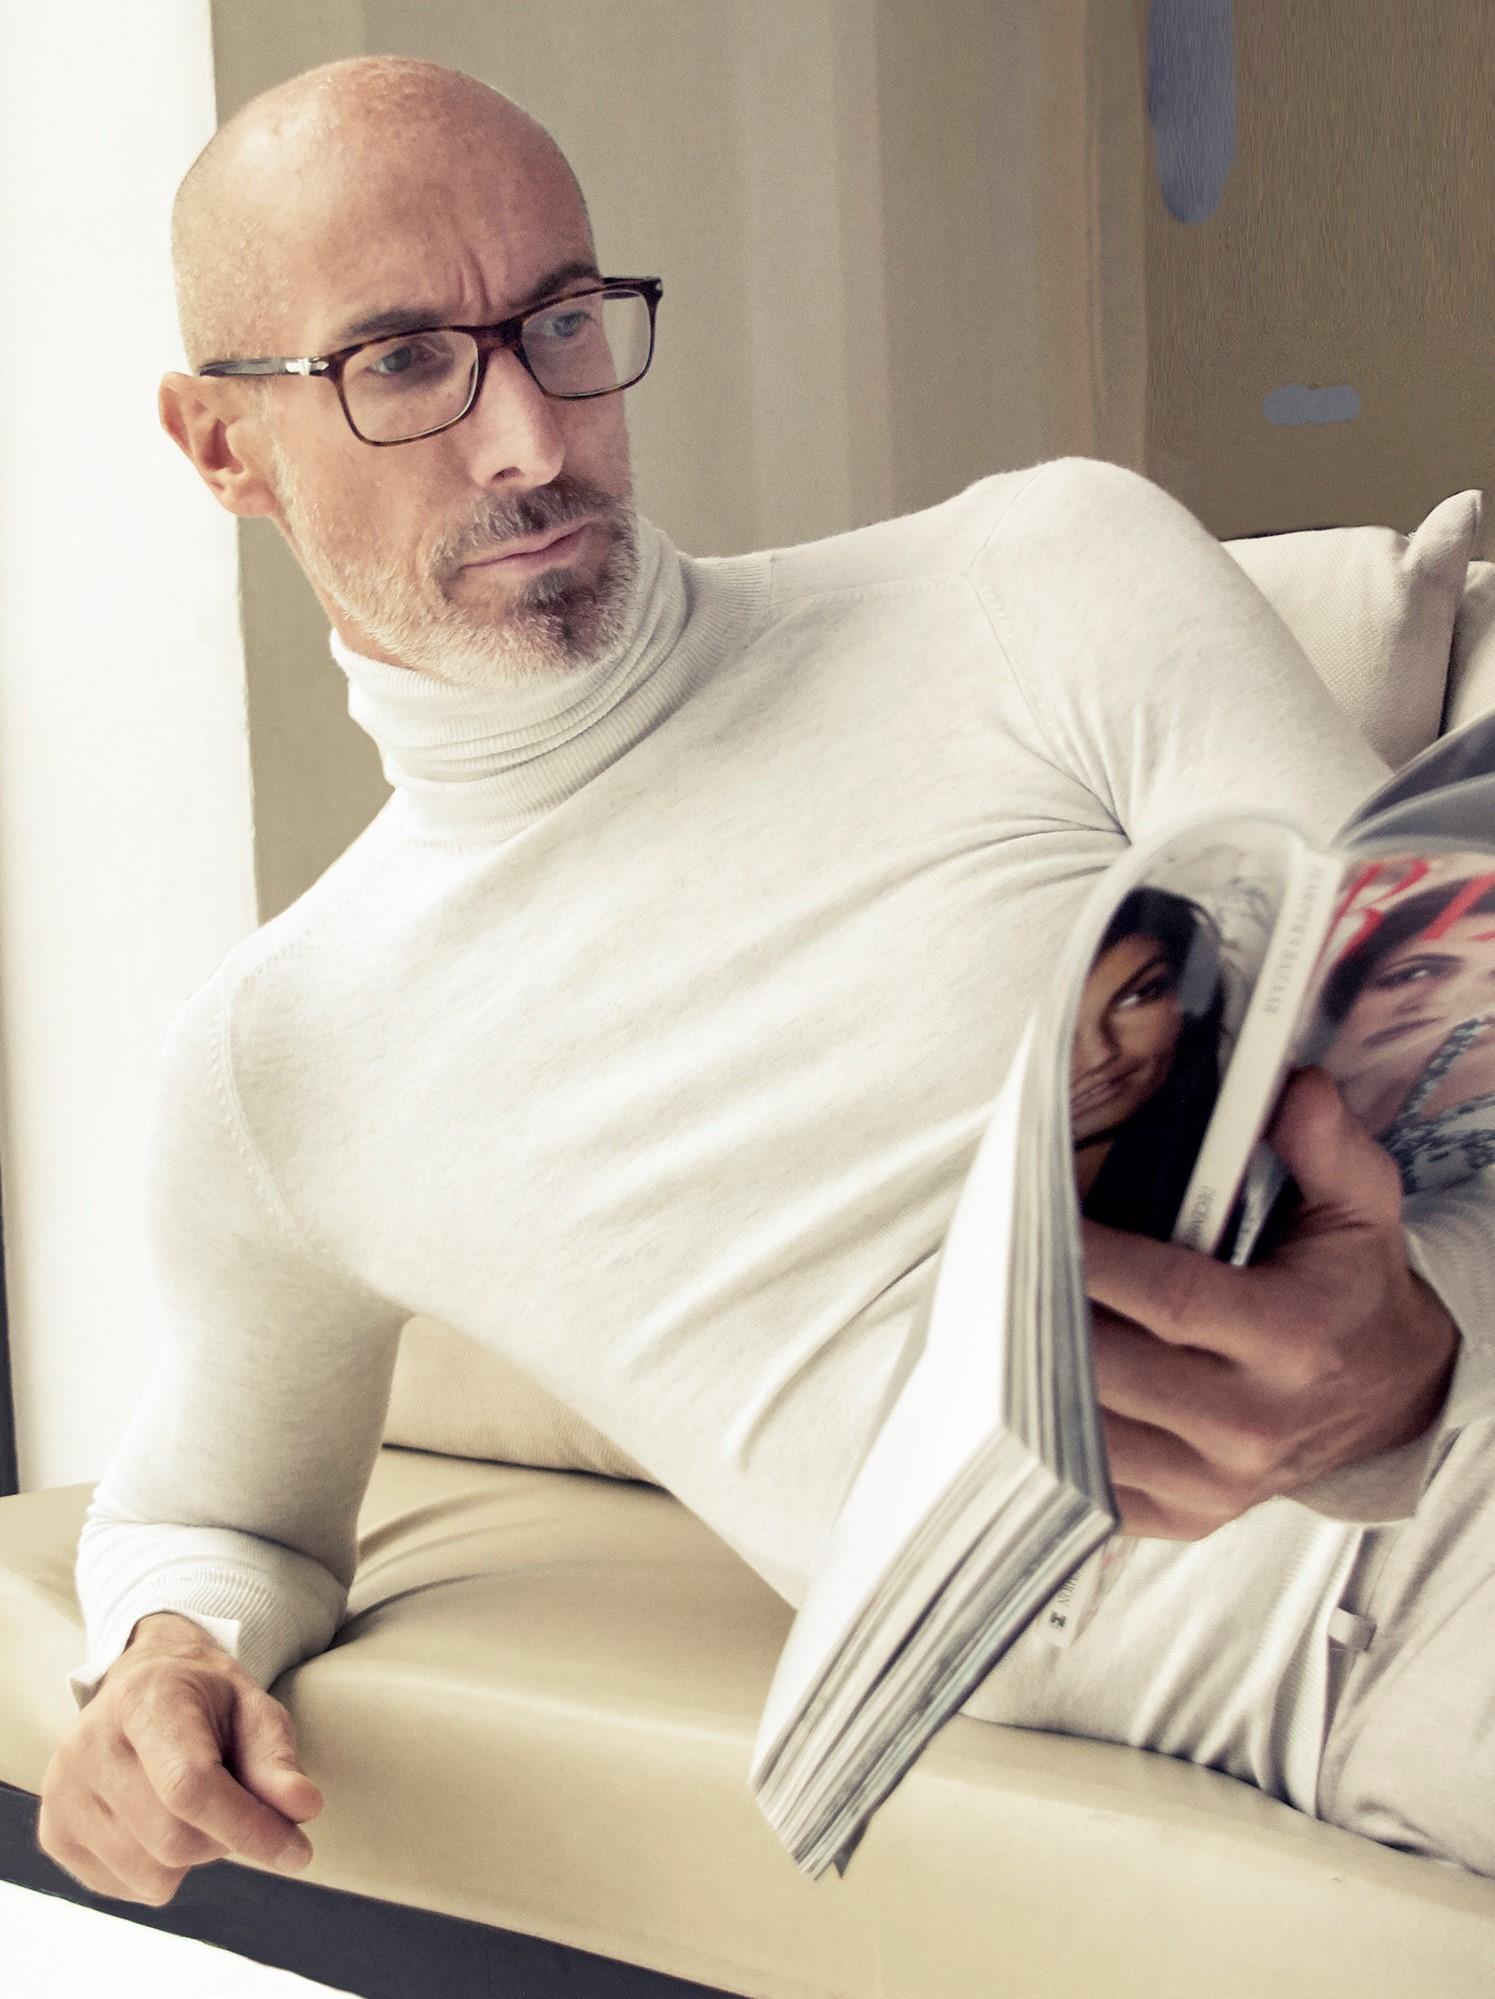 Shine-Male-Mature-Classic-Model-London-Editoral-Stefano-08-2.jpg#asset:46077